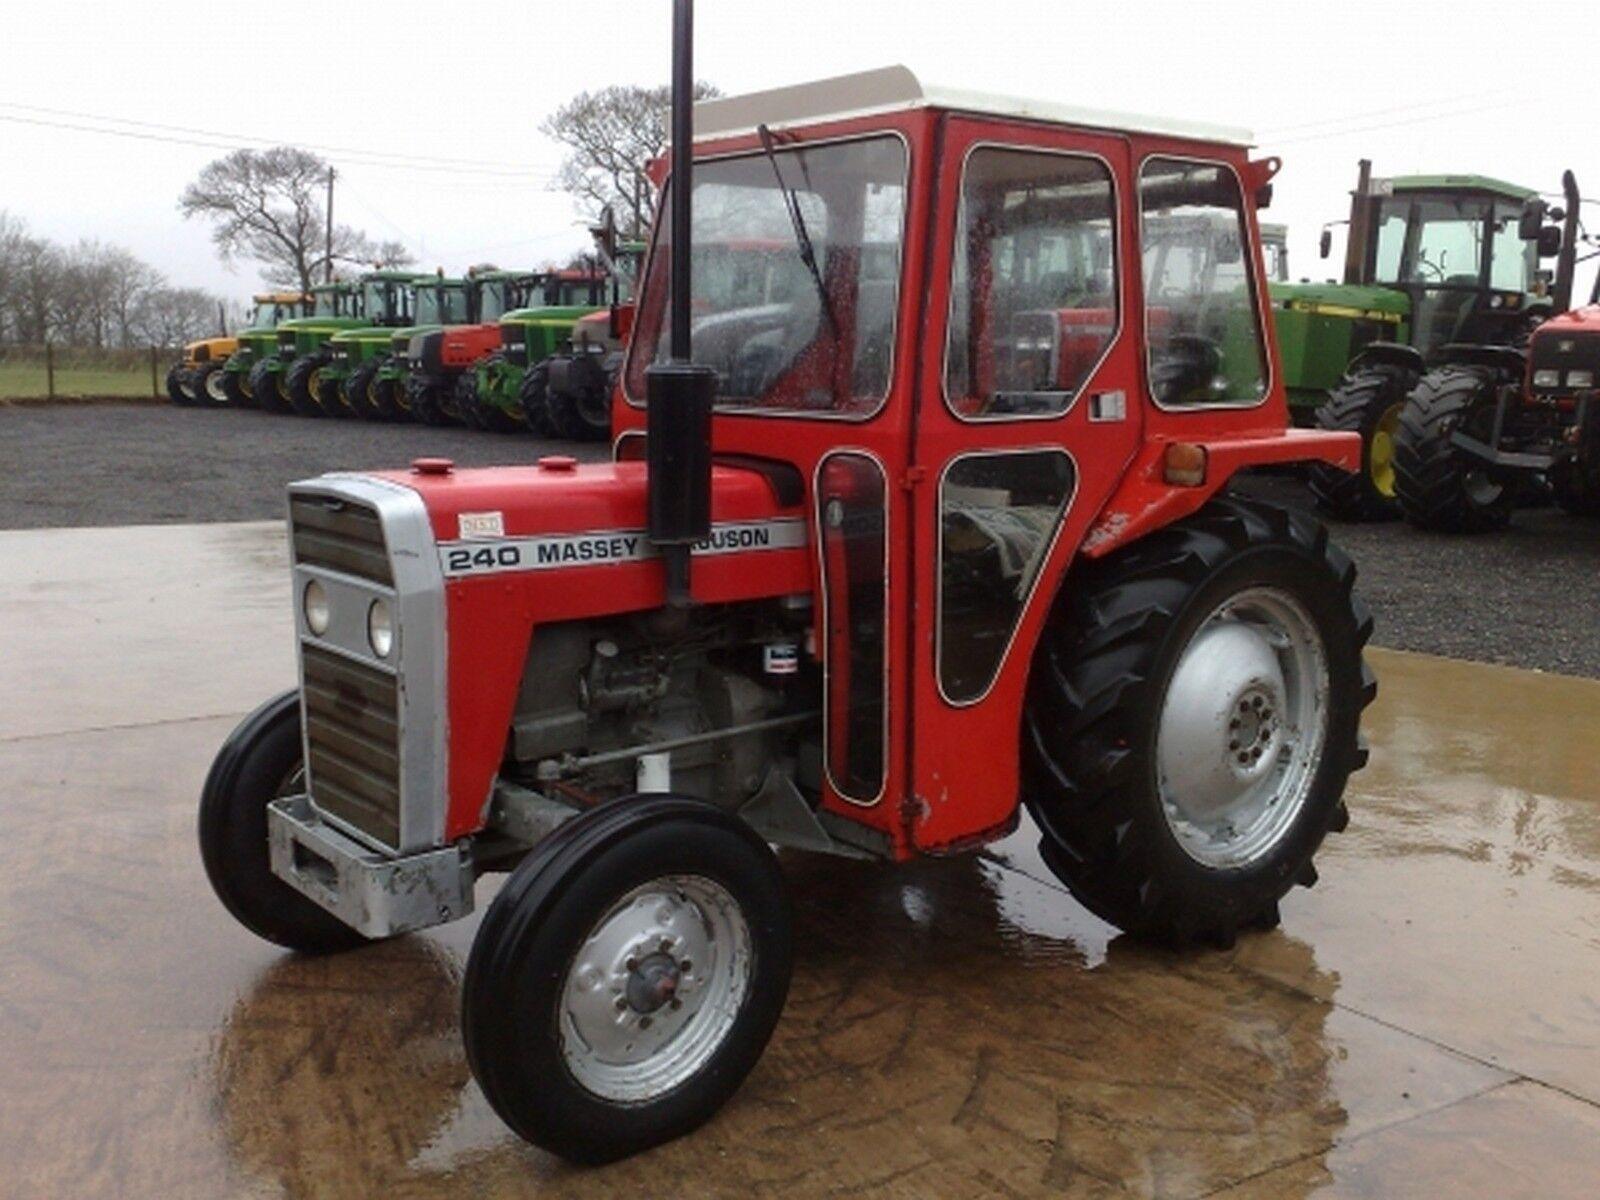 Mf 240 Tractor Grill : Massey ferguson  tractor workshop